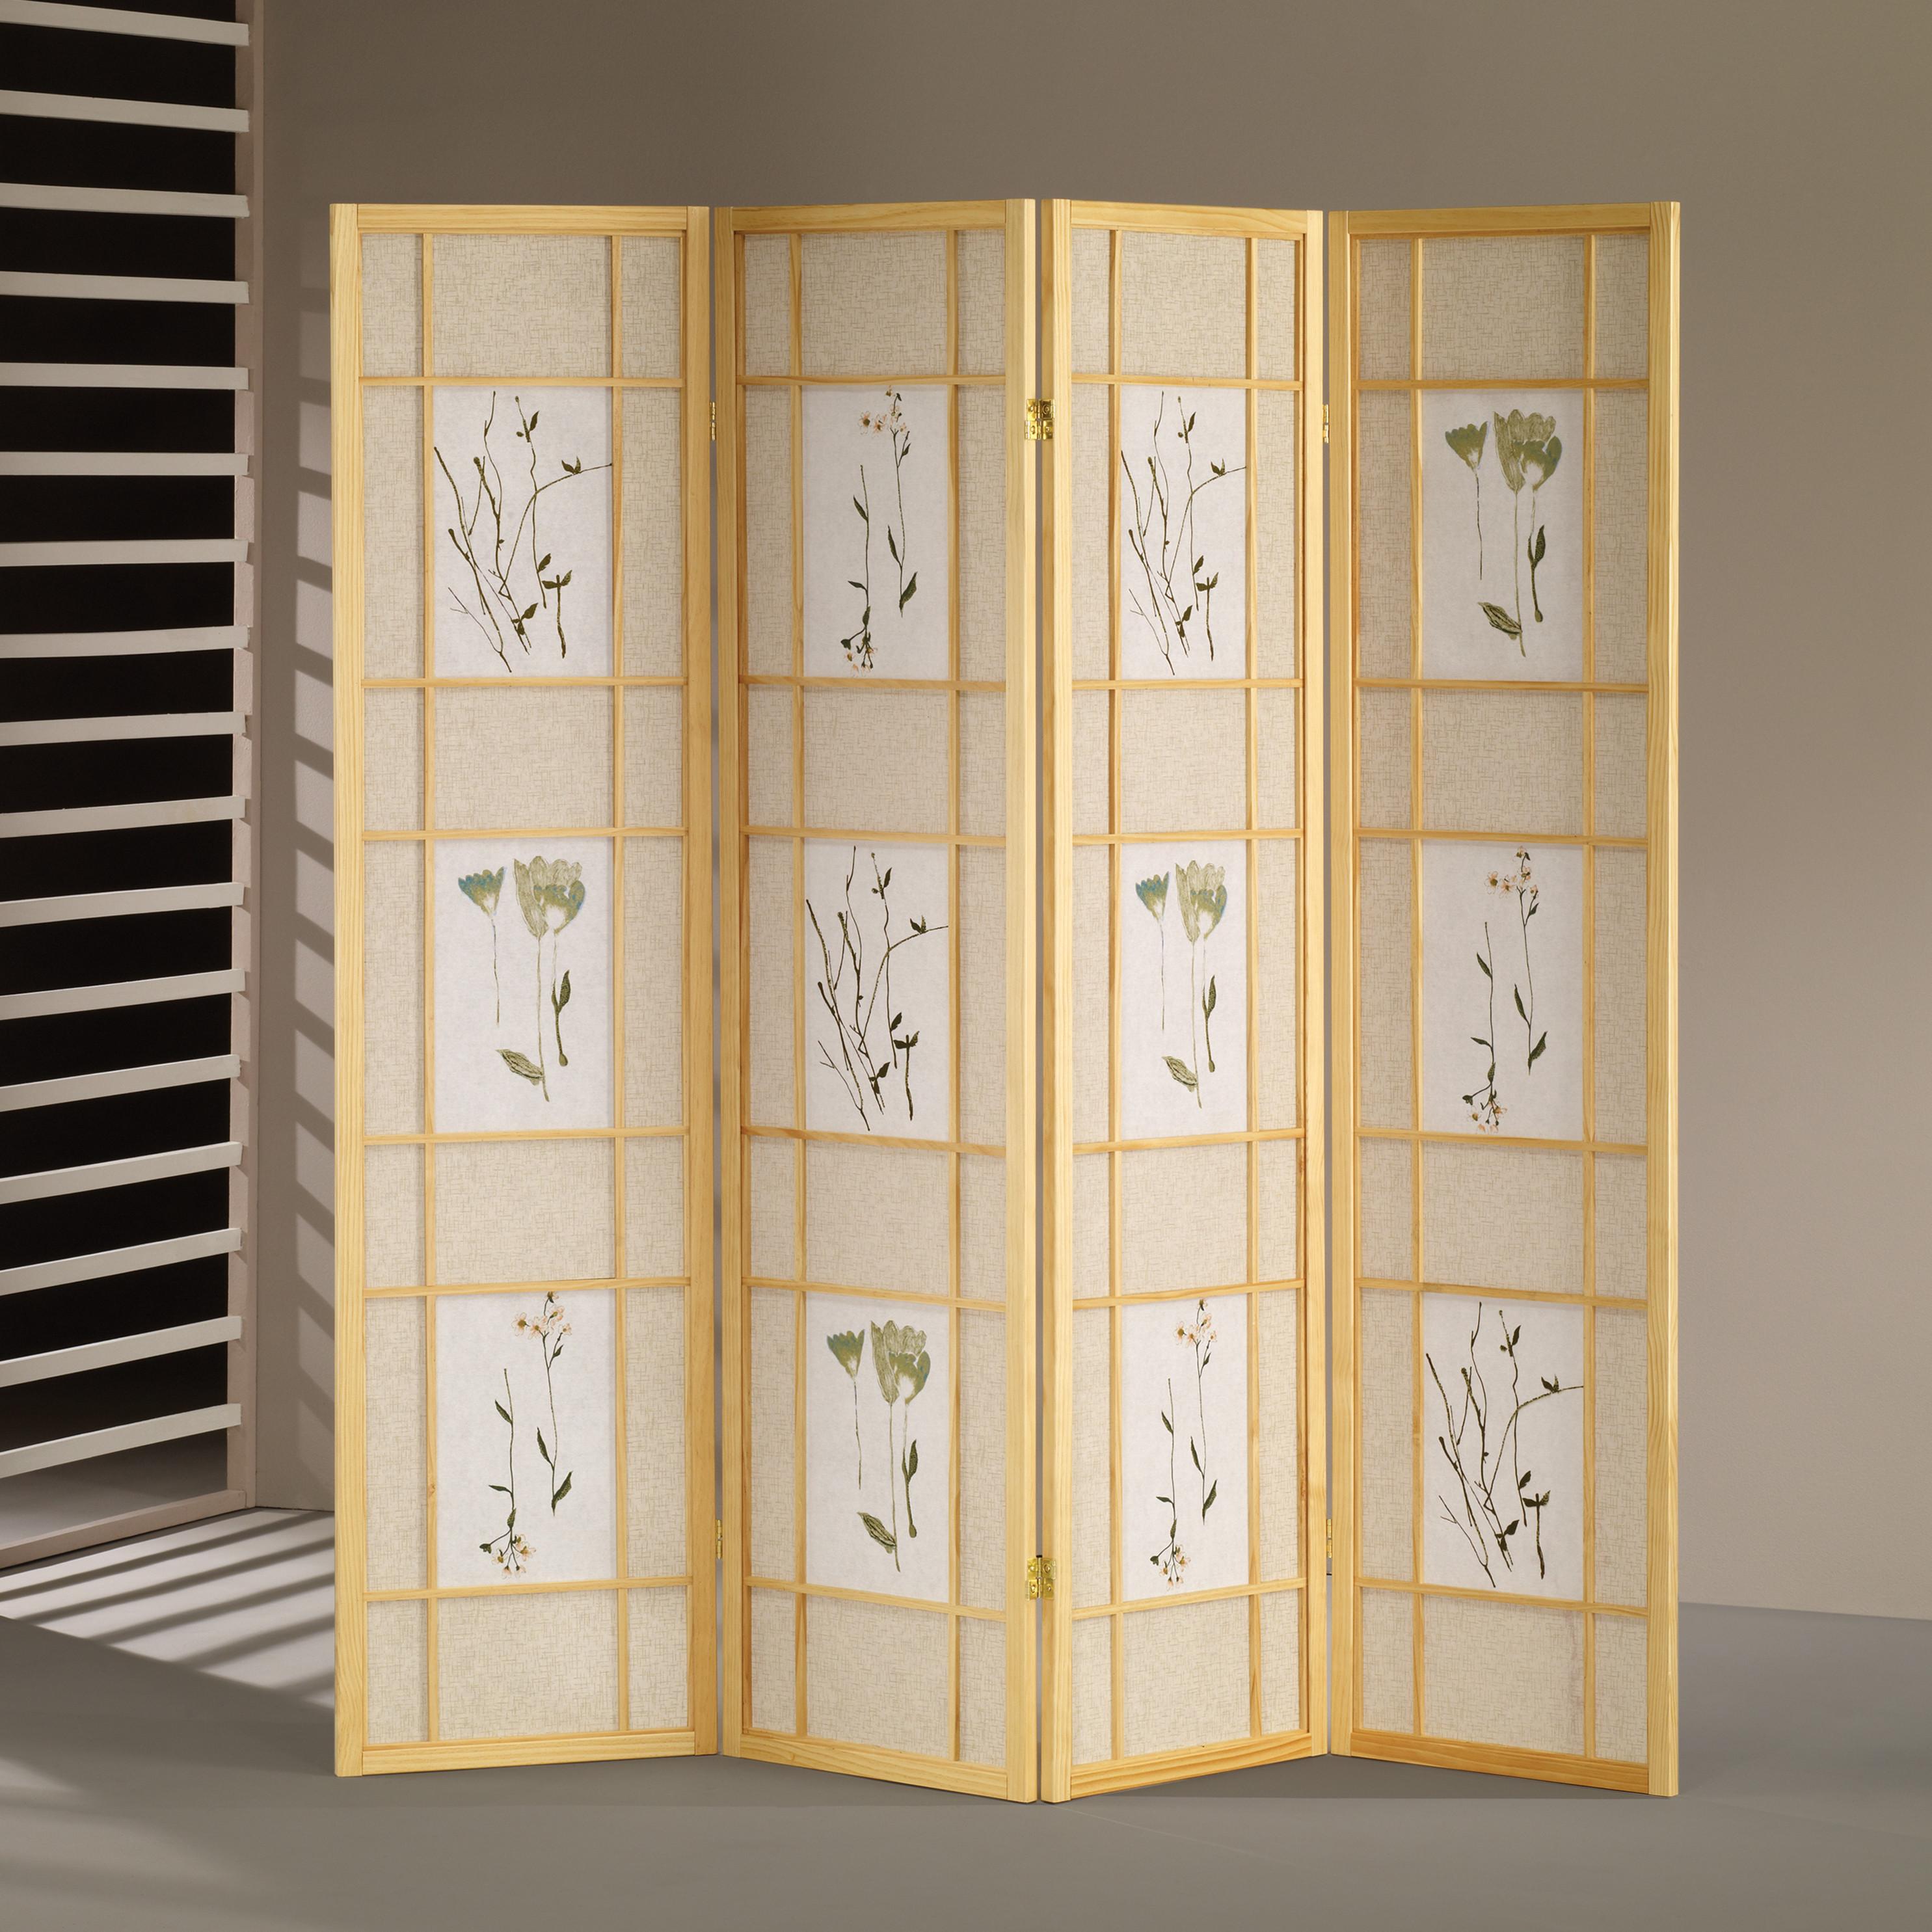 hanging room divider panels photo - 10